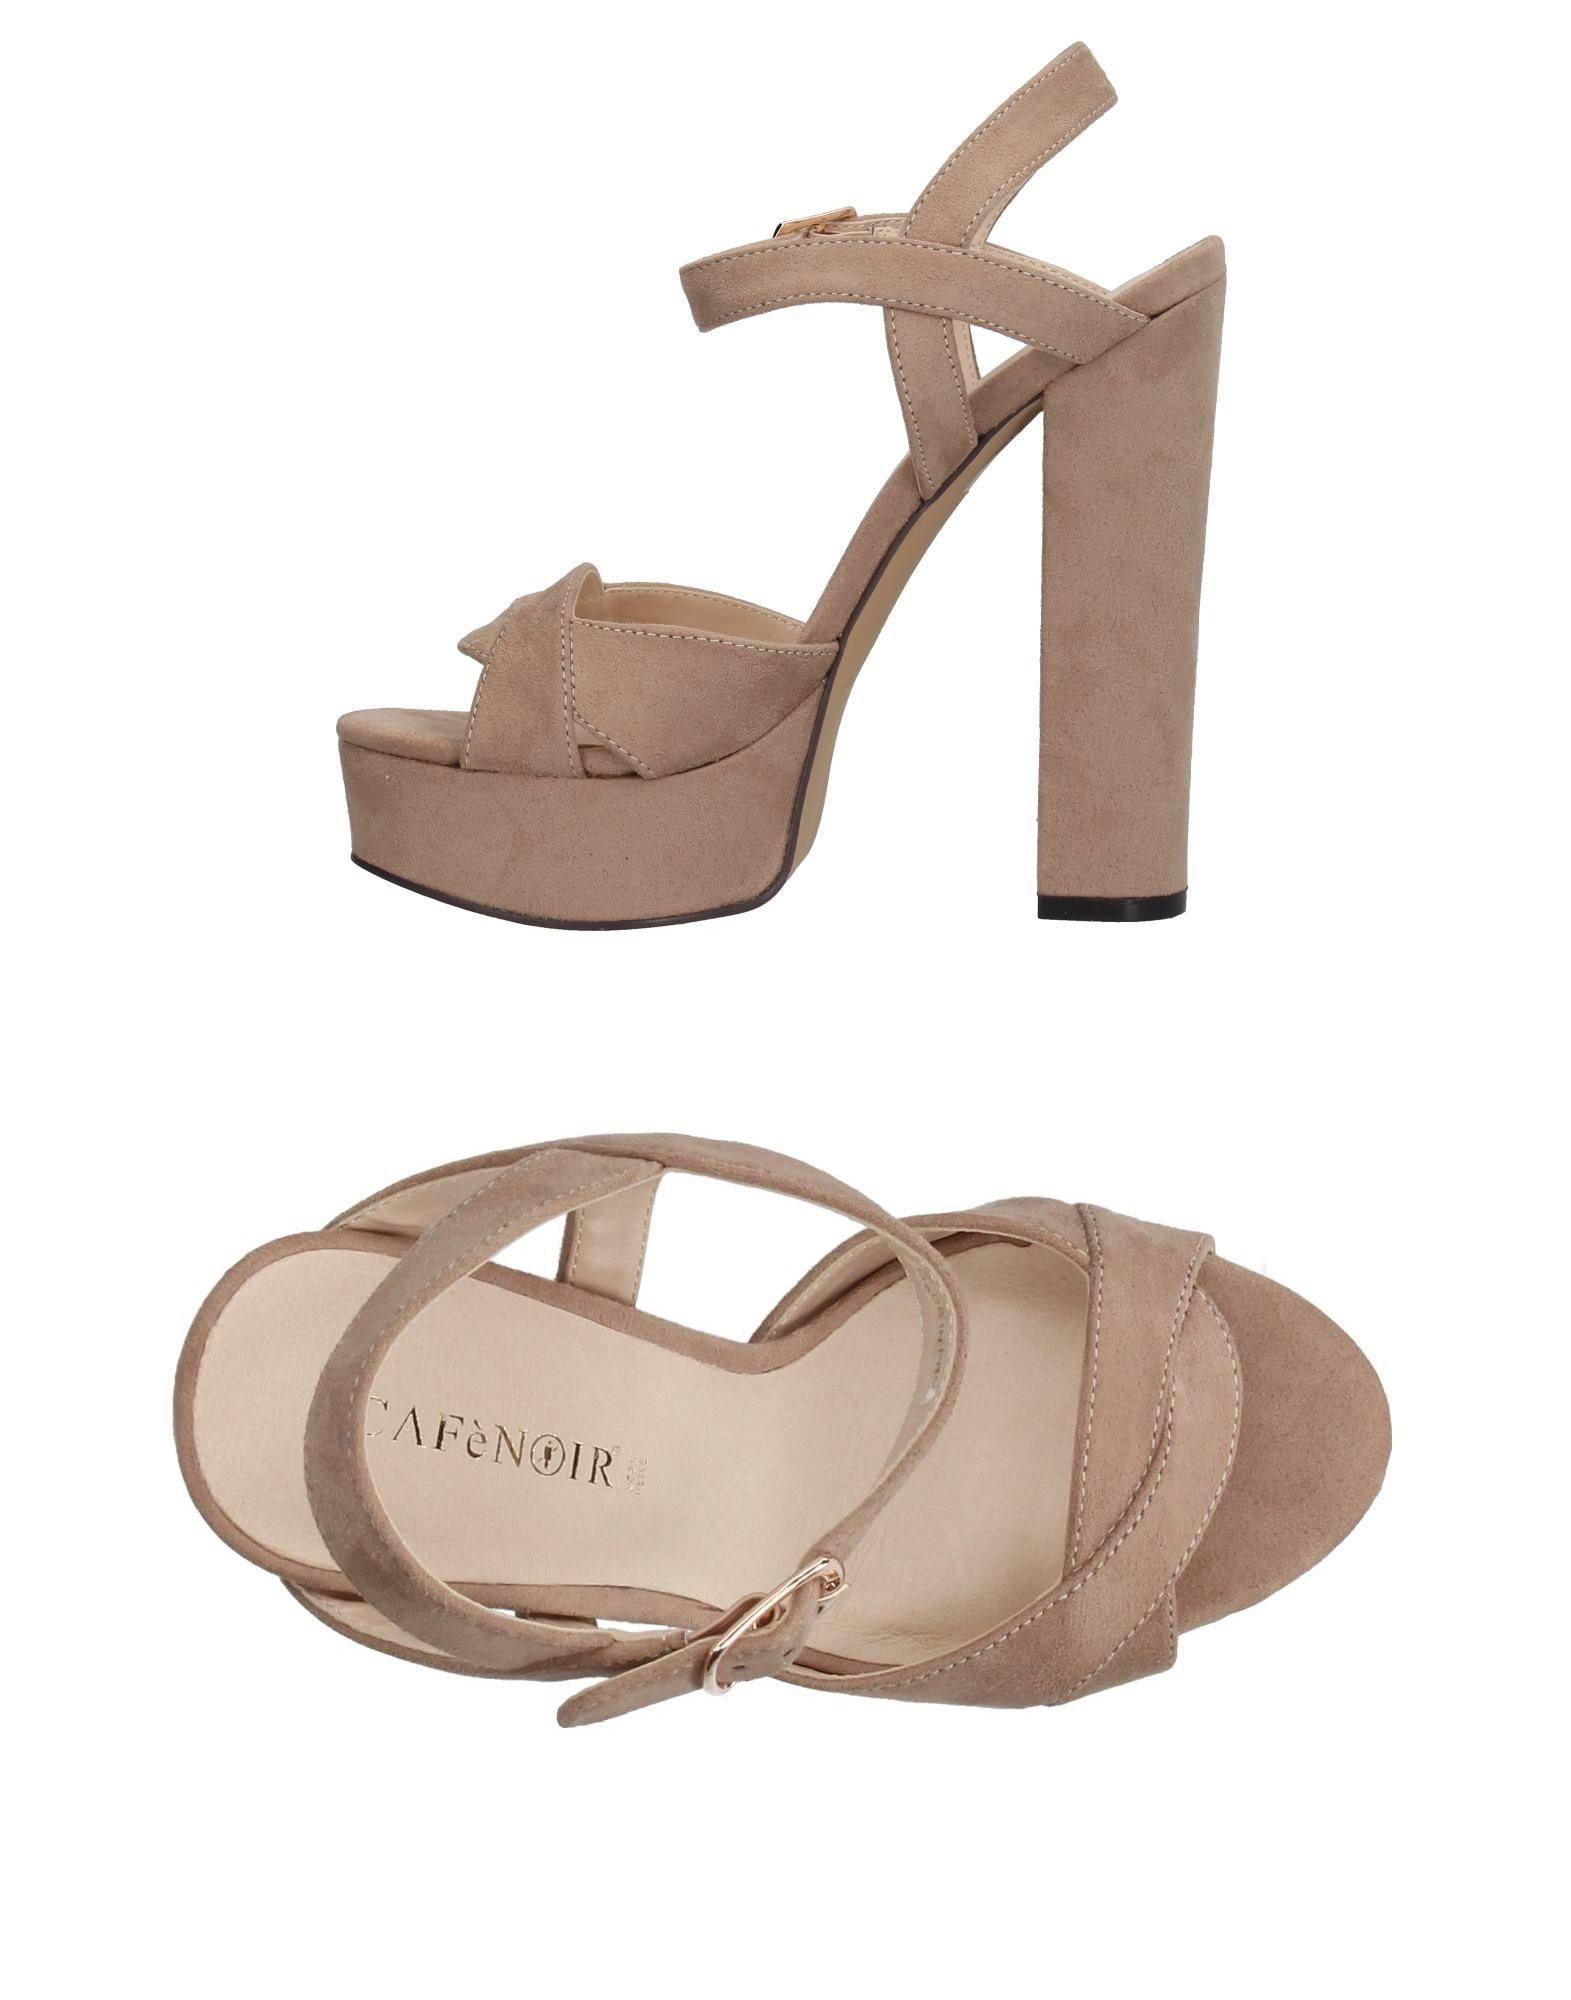 Haltbare Mode billige Schuhe Cafènoir Sandalen Damen  11208042MP Heiße Schuhe